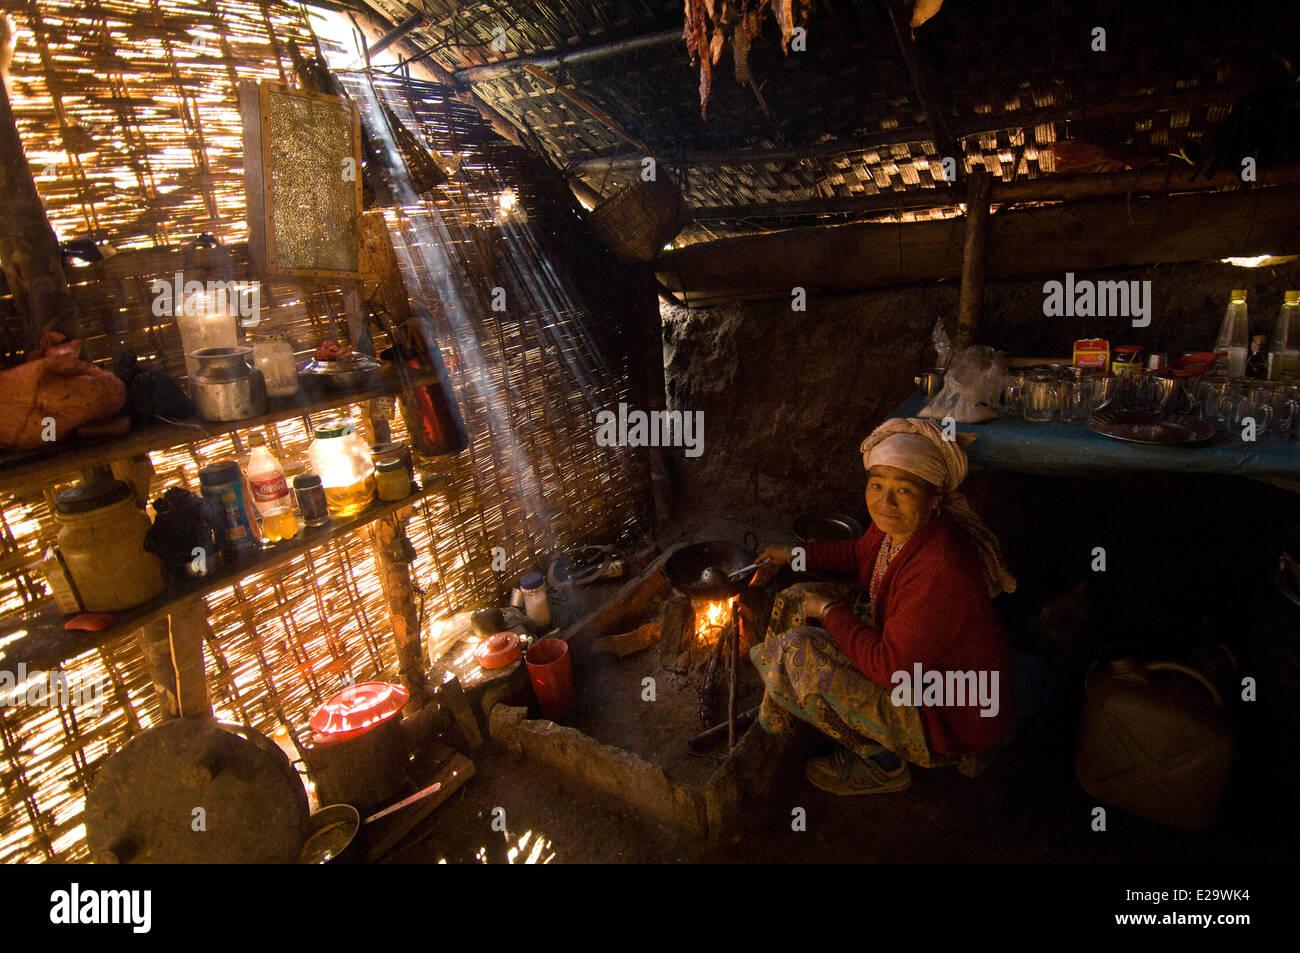 Nepal, Sagarmatha Zone, Khumbu Region, trek of the Everest Base Camp, Bupsa, tea shop - Stock Image